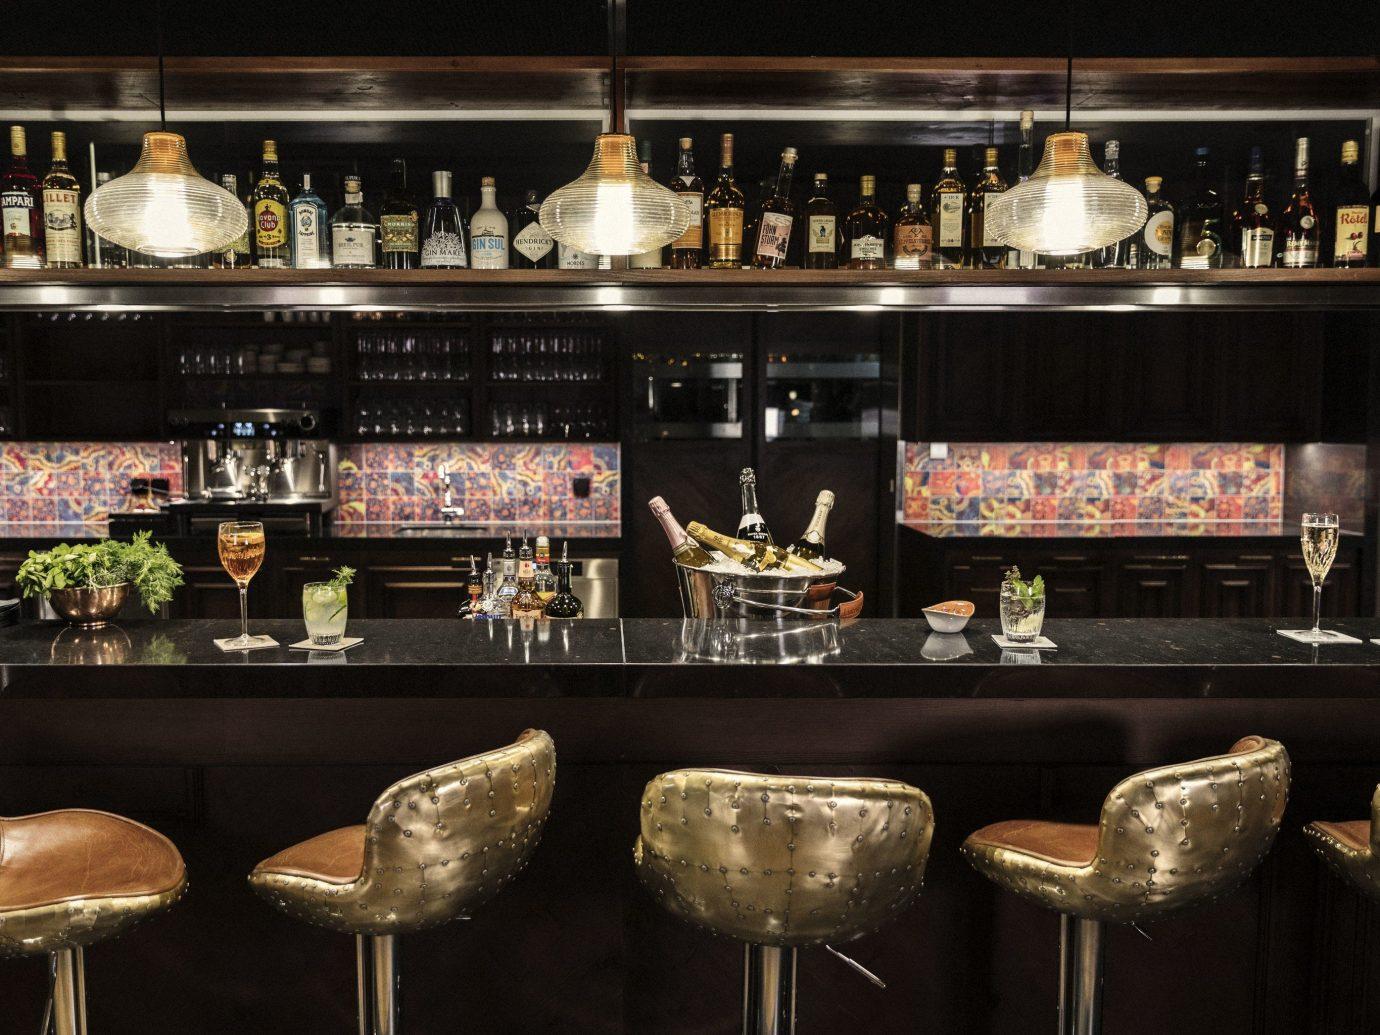 Boutique Hotels Hotels Outdoors + Adventure Winter indoor Bar restaurant interior design different Drink several